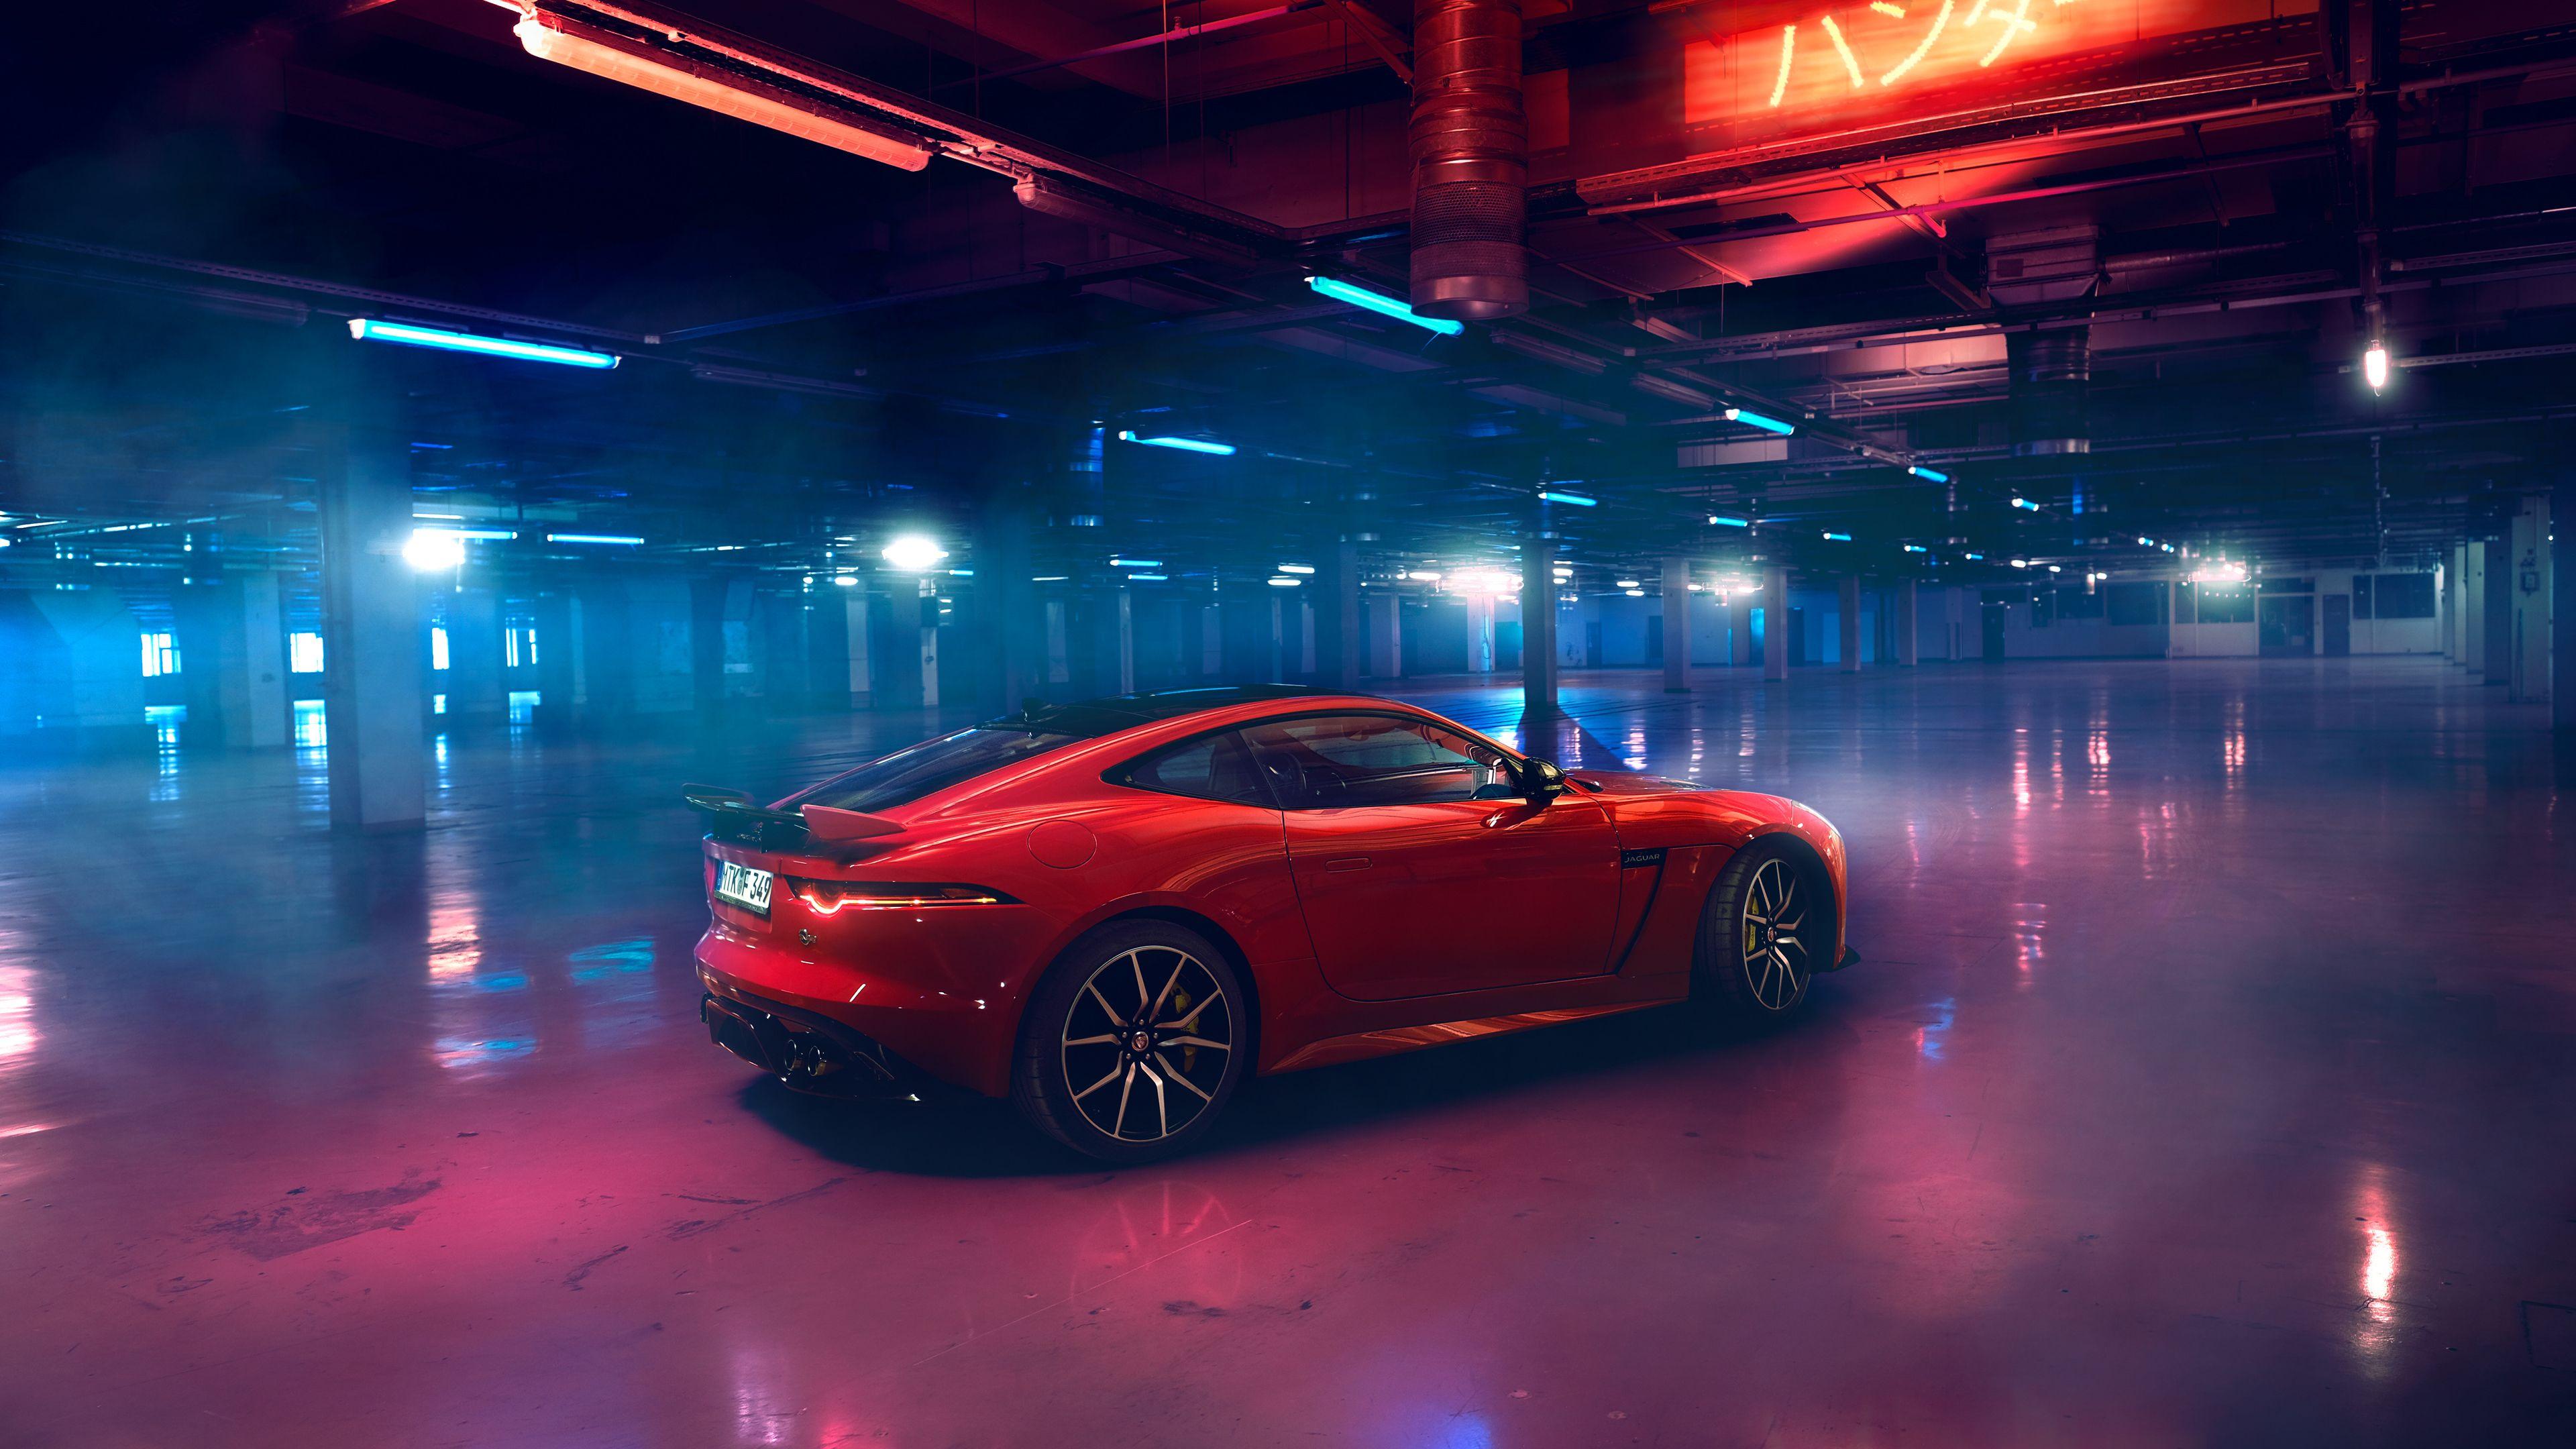 Jaguar F Type 2018 Rear jaguar wallpapers, jaguar f type wallpapers, hd-wallpape…